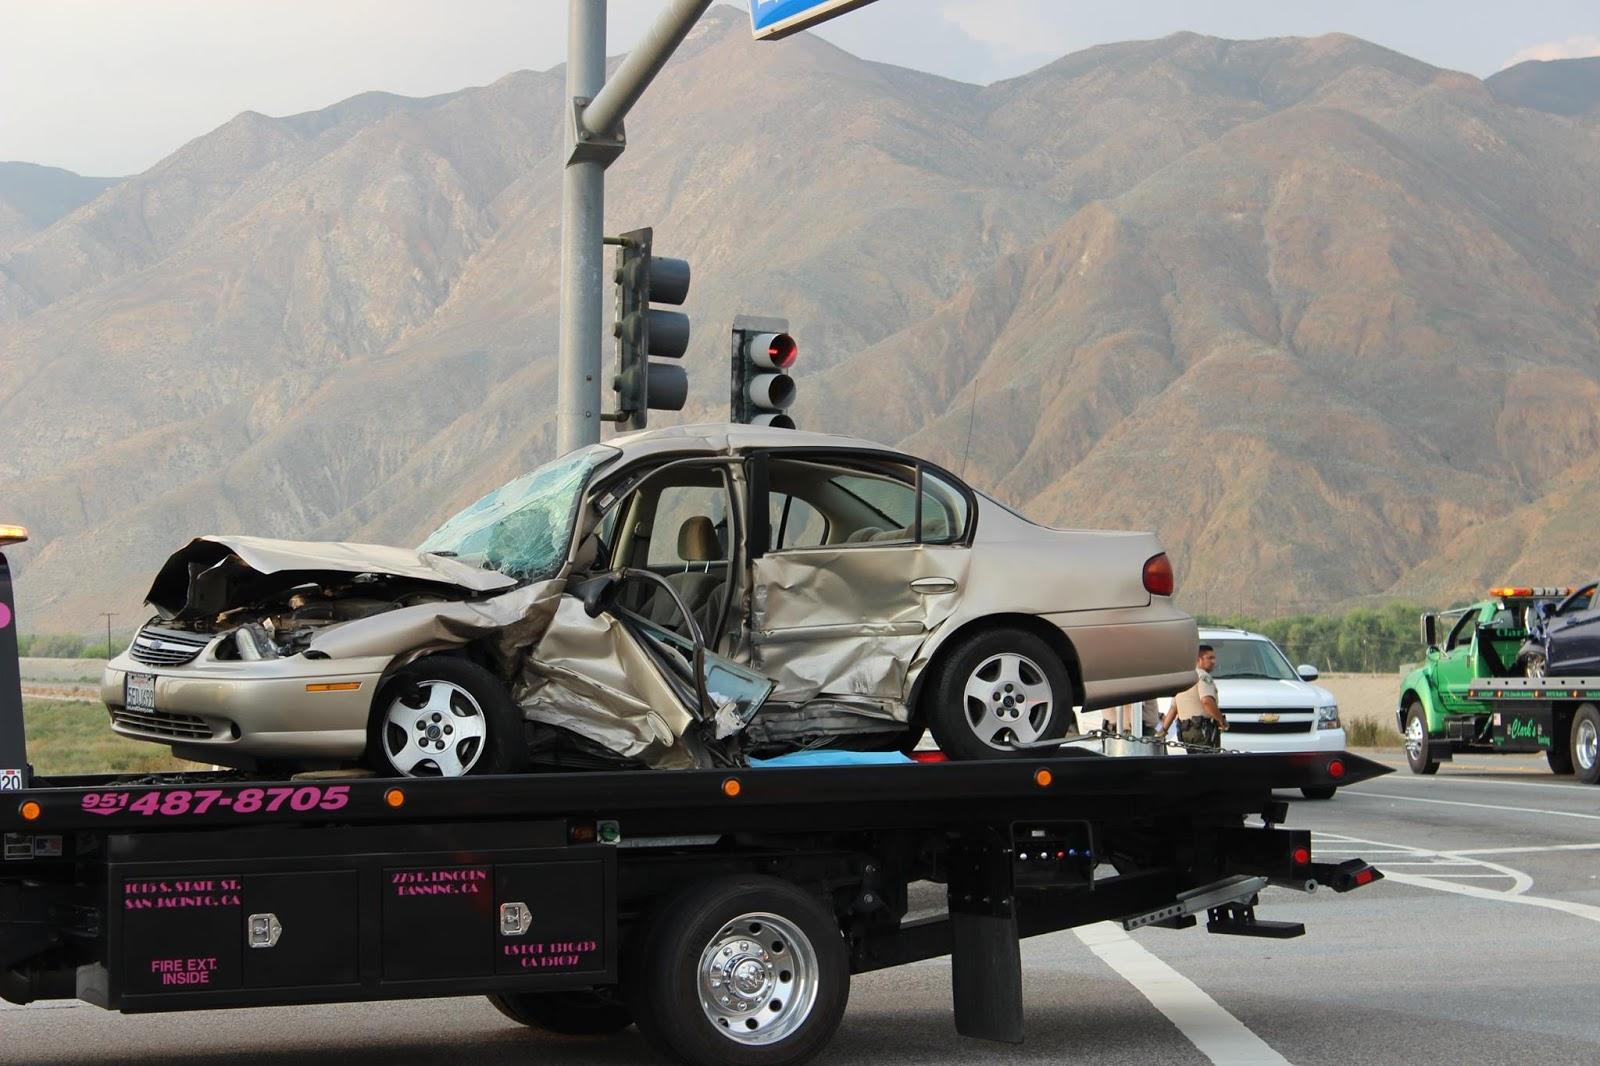 HemetEyeNews: Fatal early morning accident on Saturday in